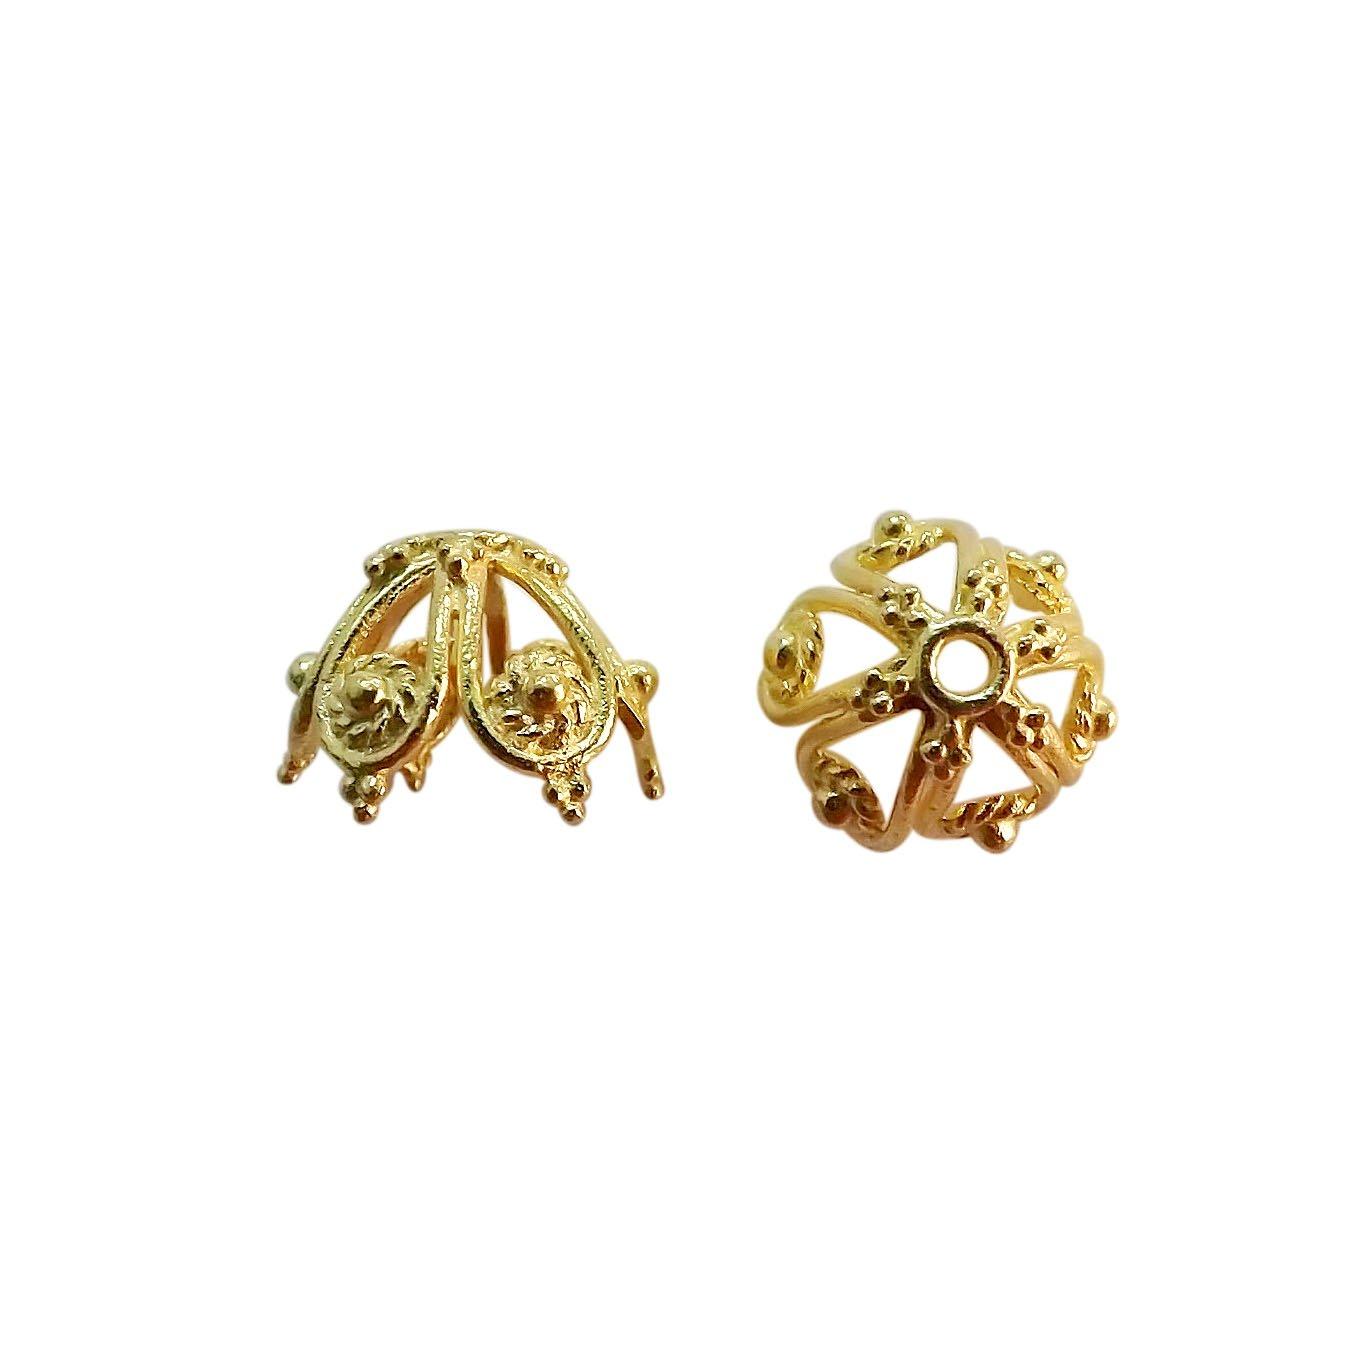 18K Gold Overlay Bead Cap CG-331-12X15MM Bali Designs